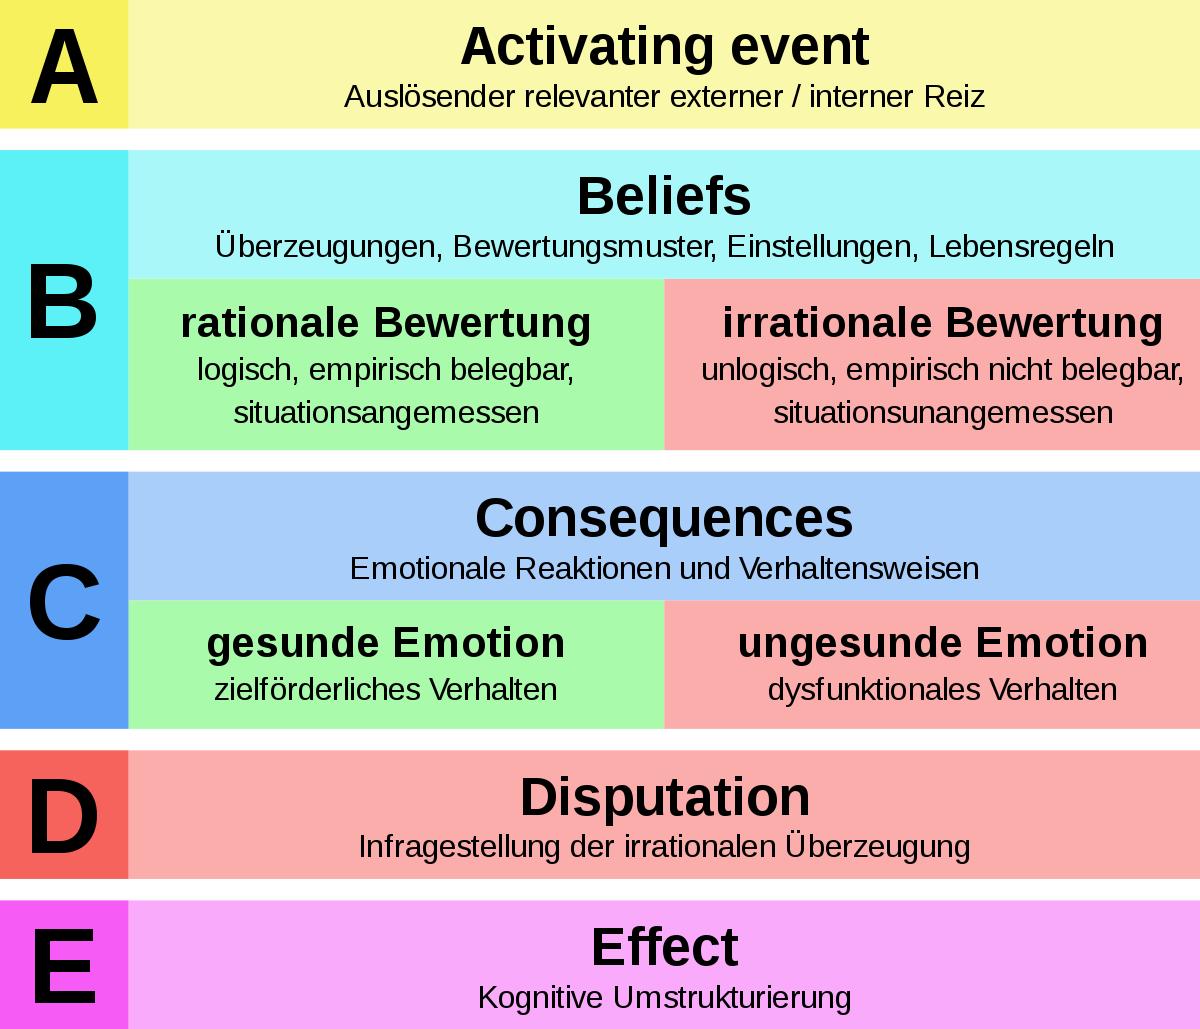 Rational Emotive Verhaltenstherapie Wikipedia